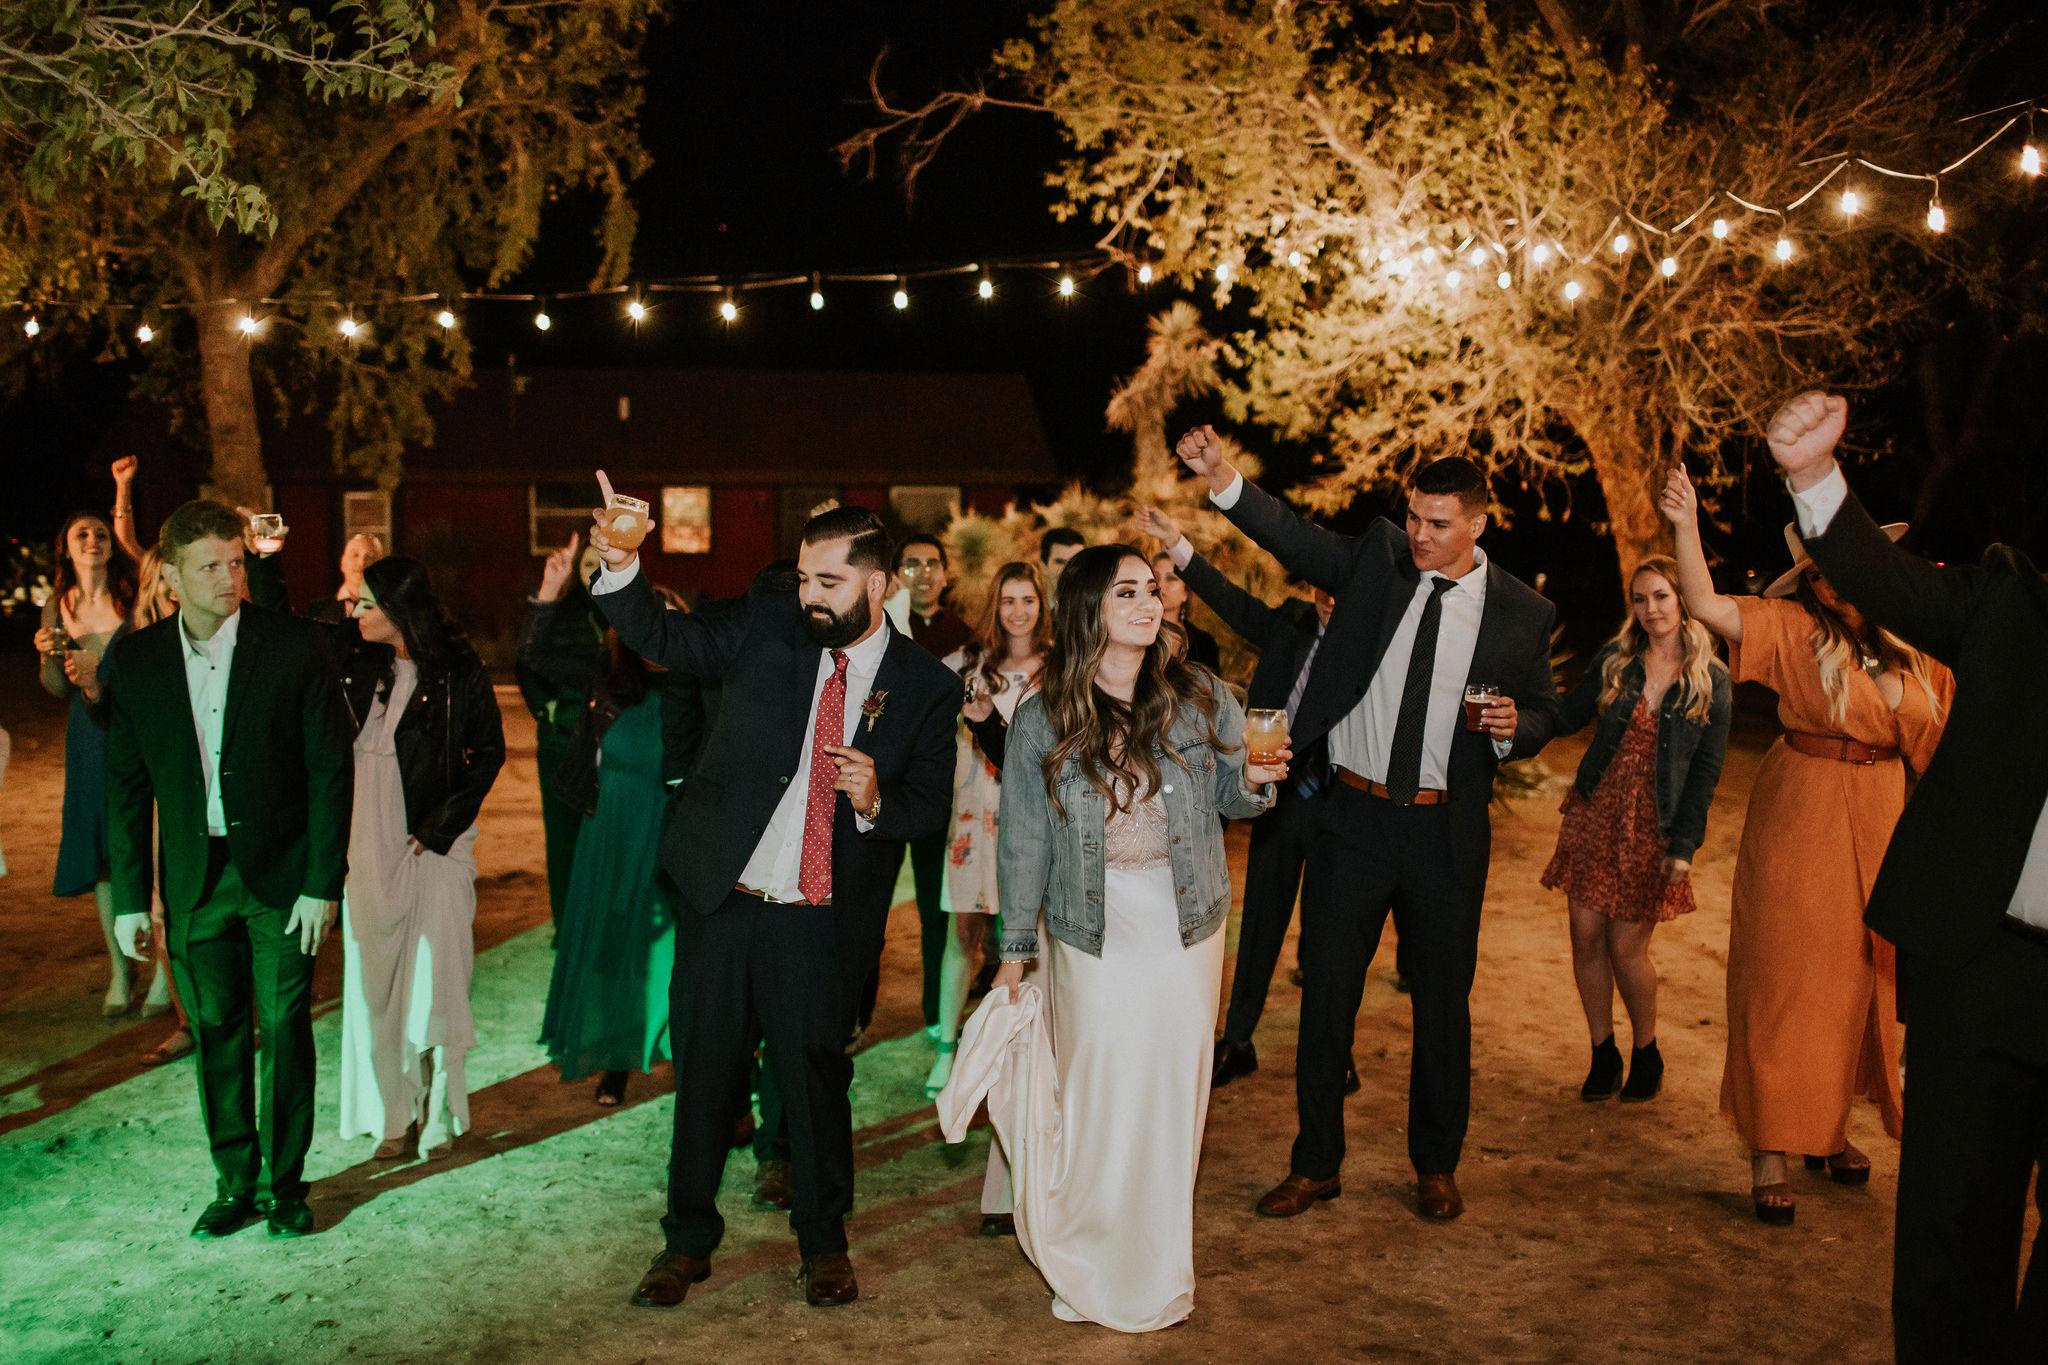 RimrockRanch-JoshuaTree-Wedding-Jami-Laree-1097.jpg